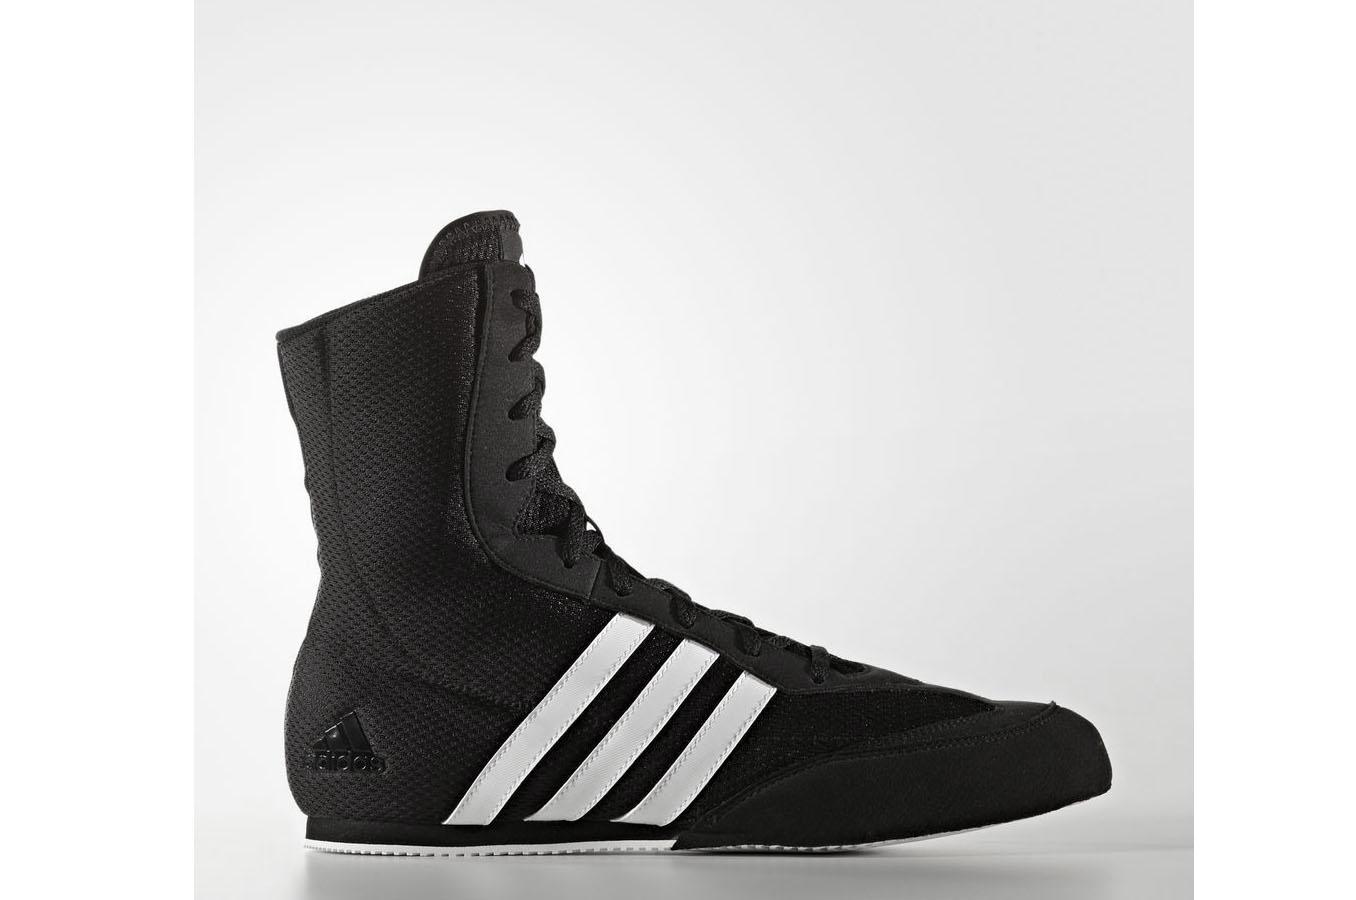 Chaussures Boxe Anglaise Box Hog, Adidas G97067 mFndqizP